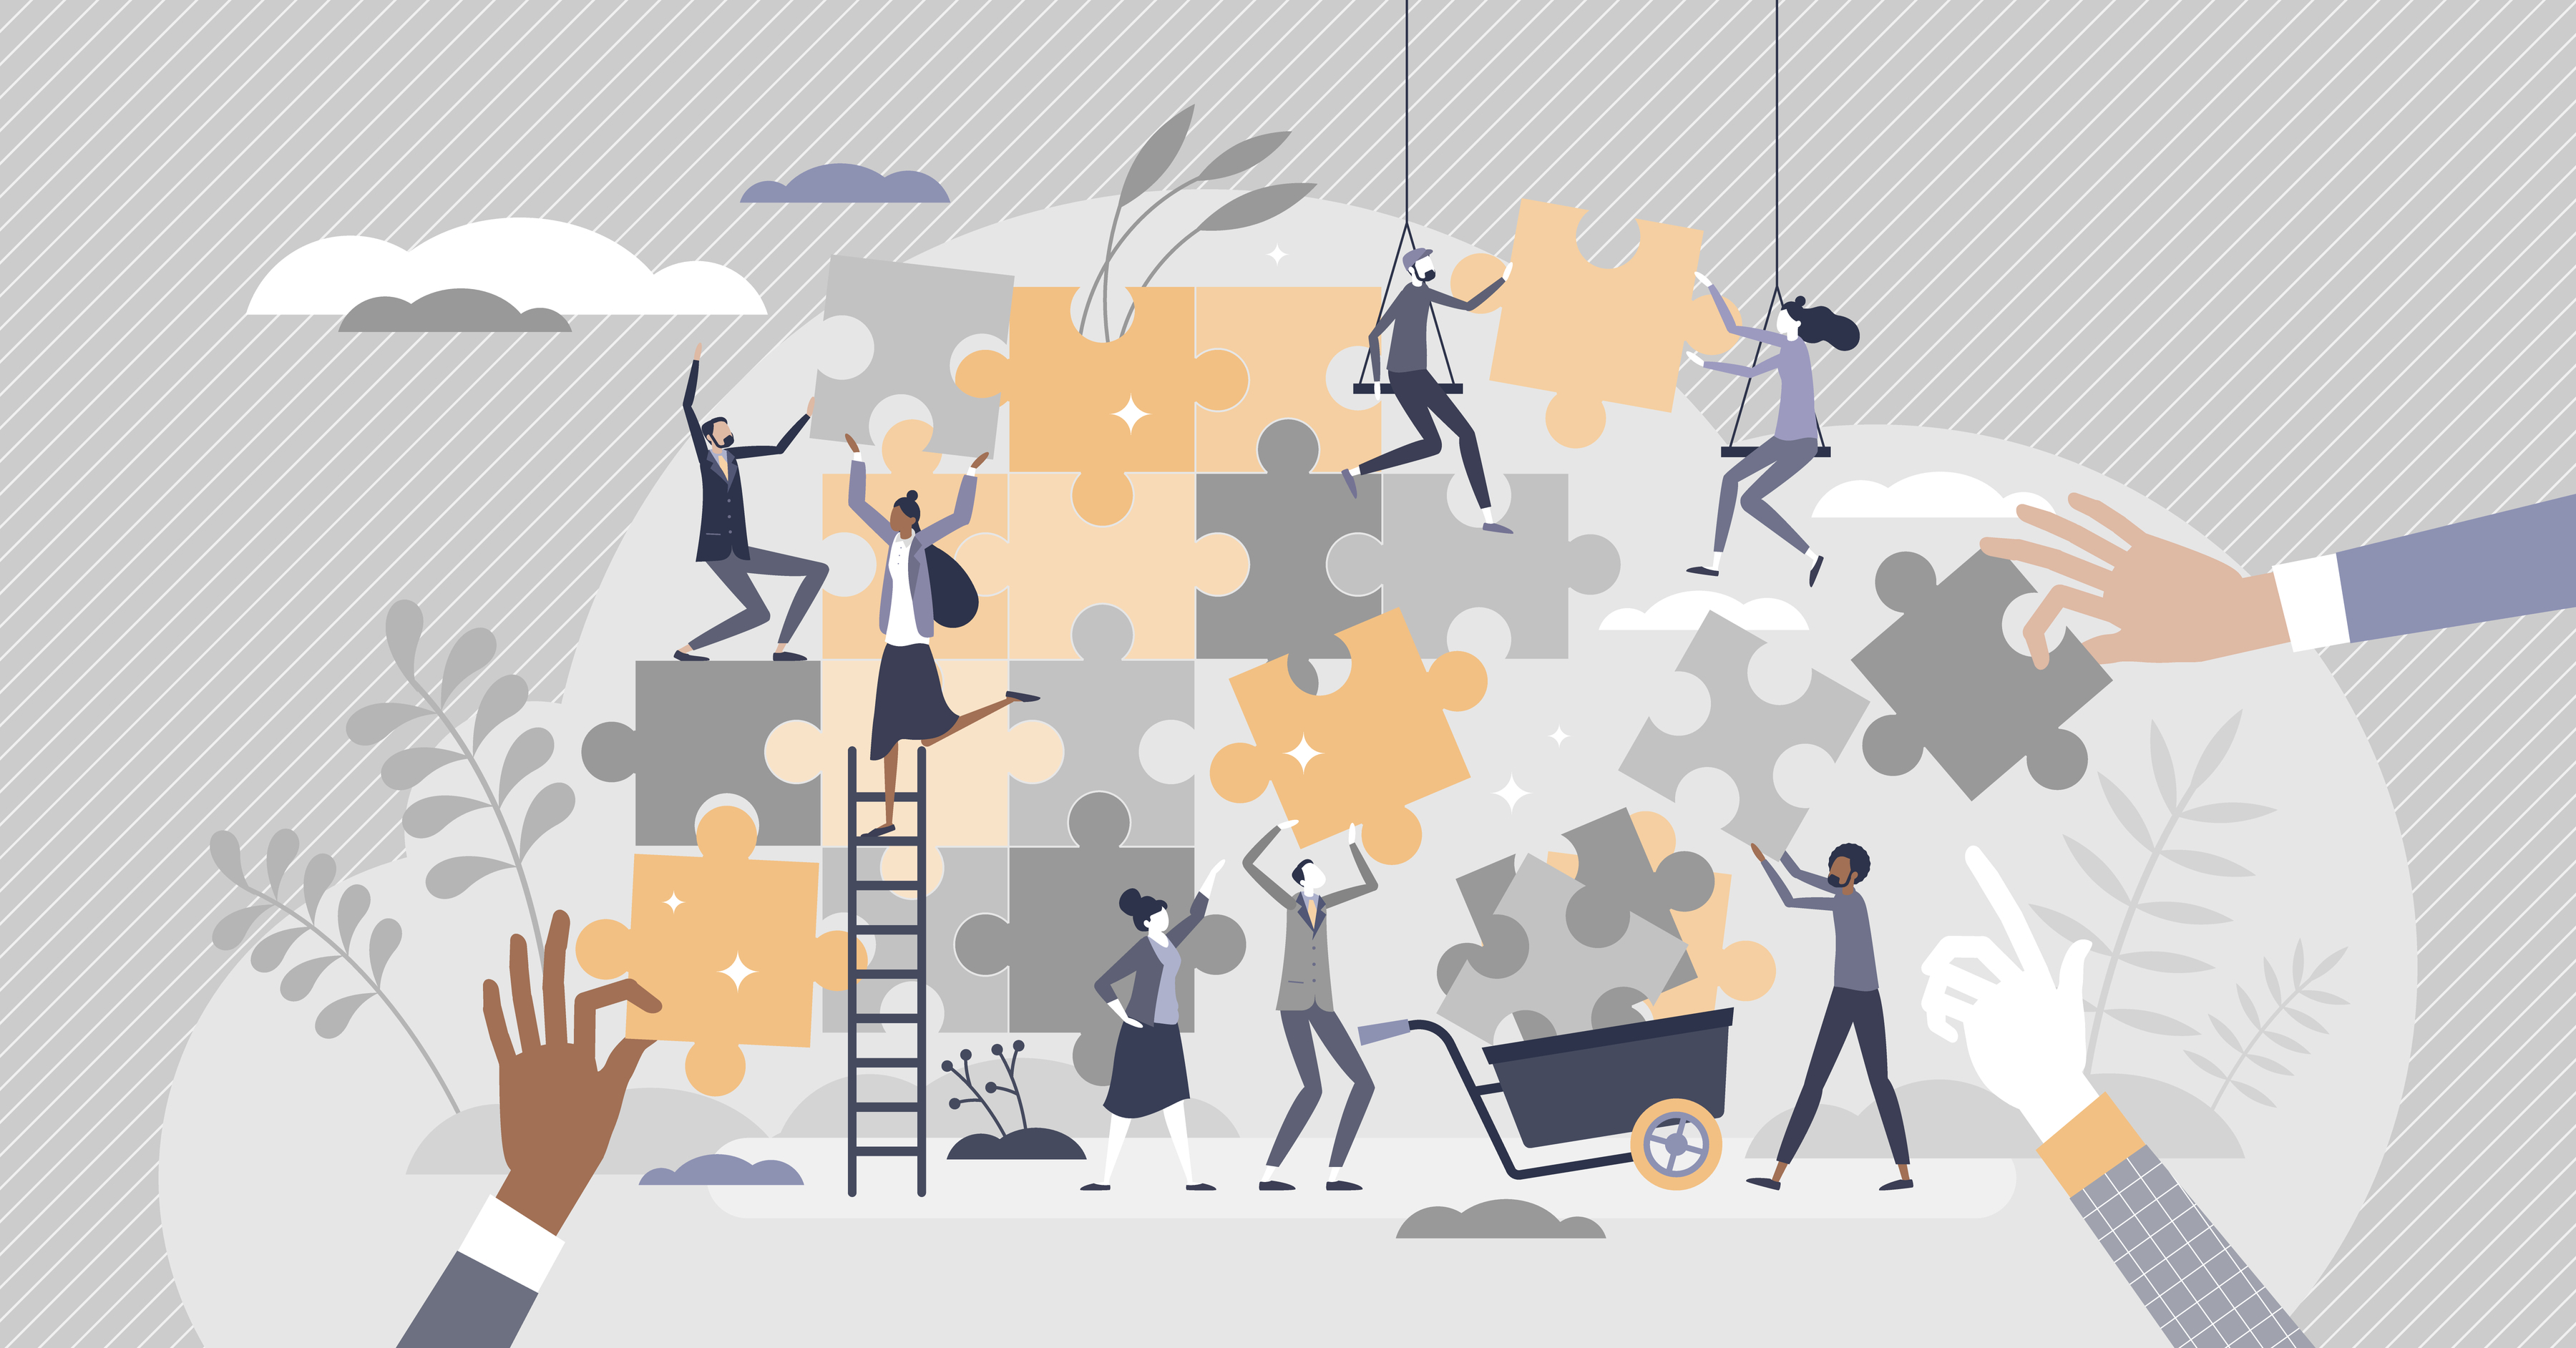 Illustration conveying teamwork